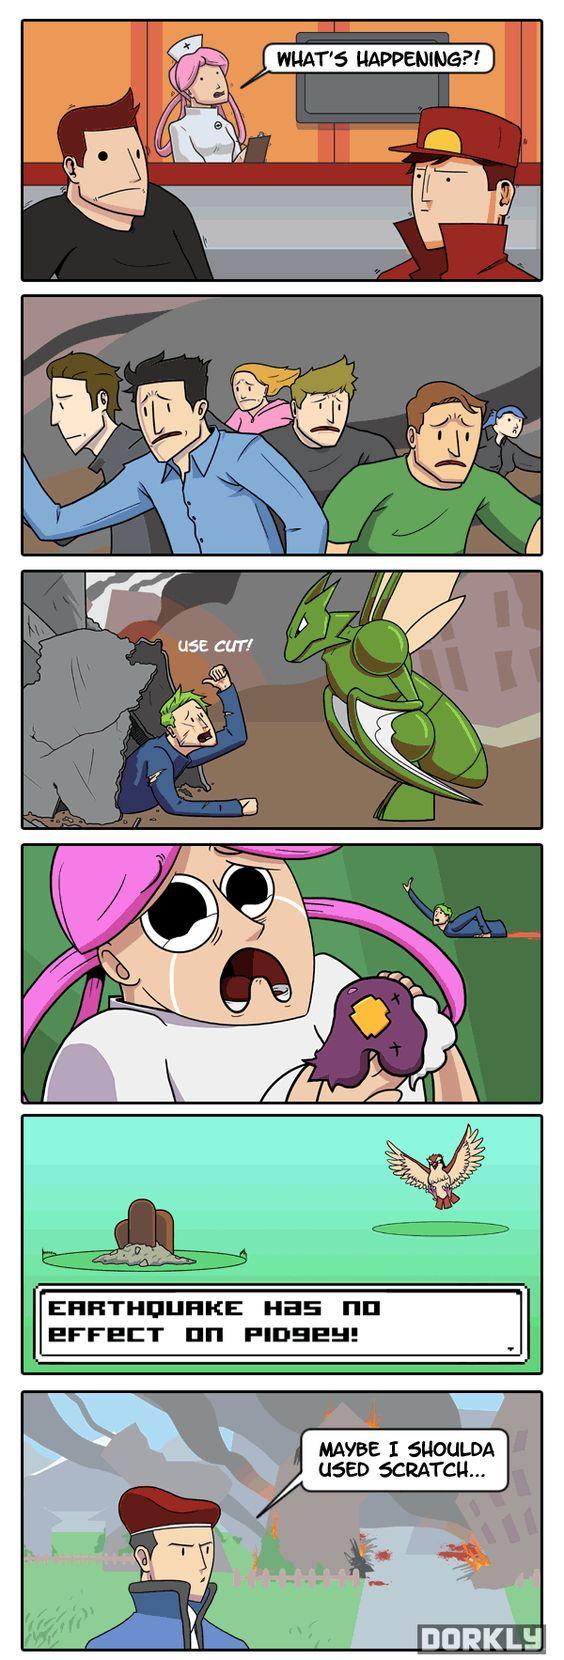 The world of pokemon cruel as always